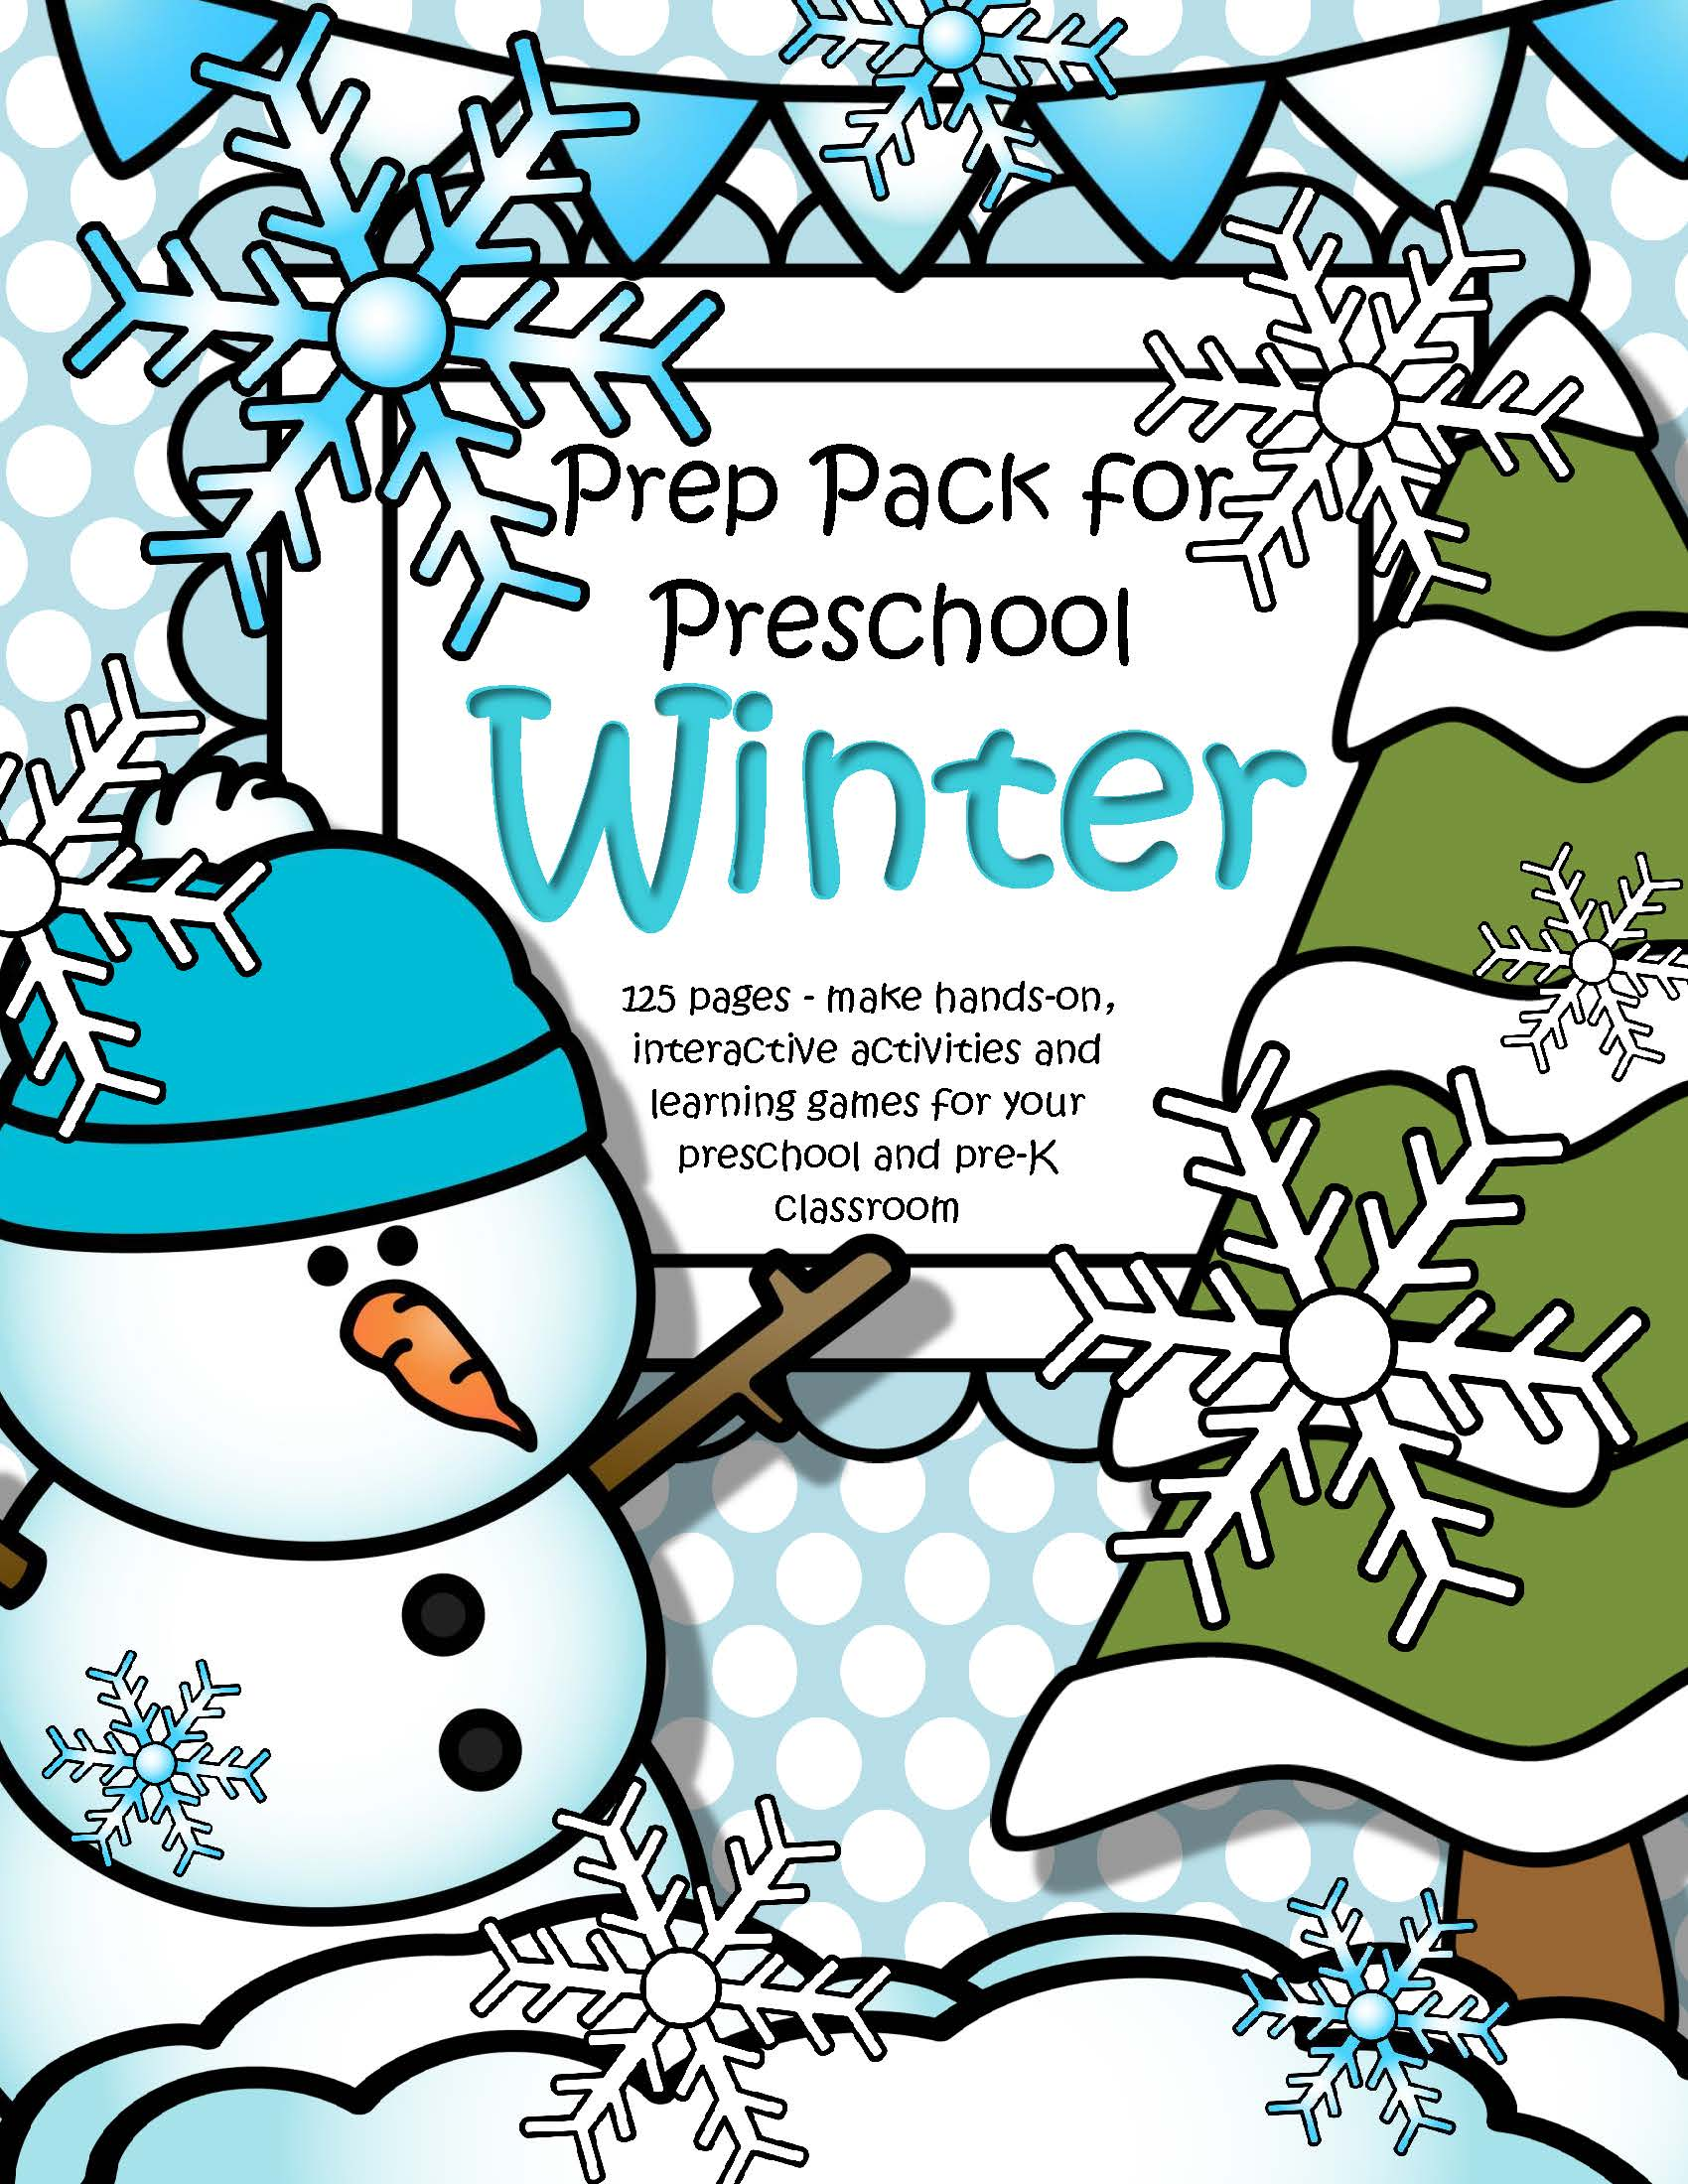 Winter Theme Pack For Preschool